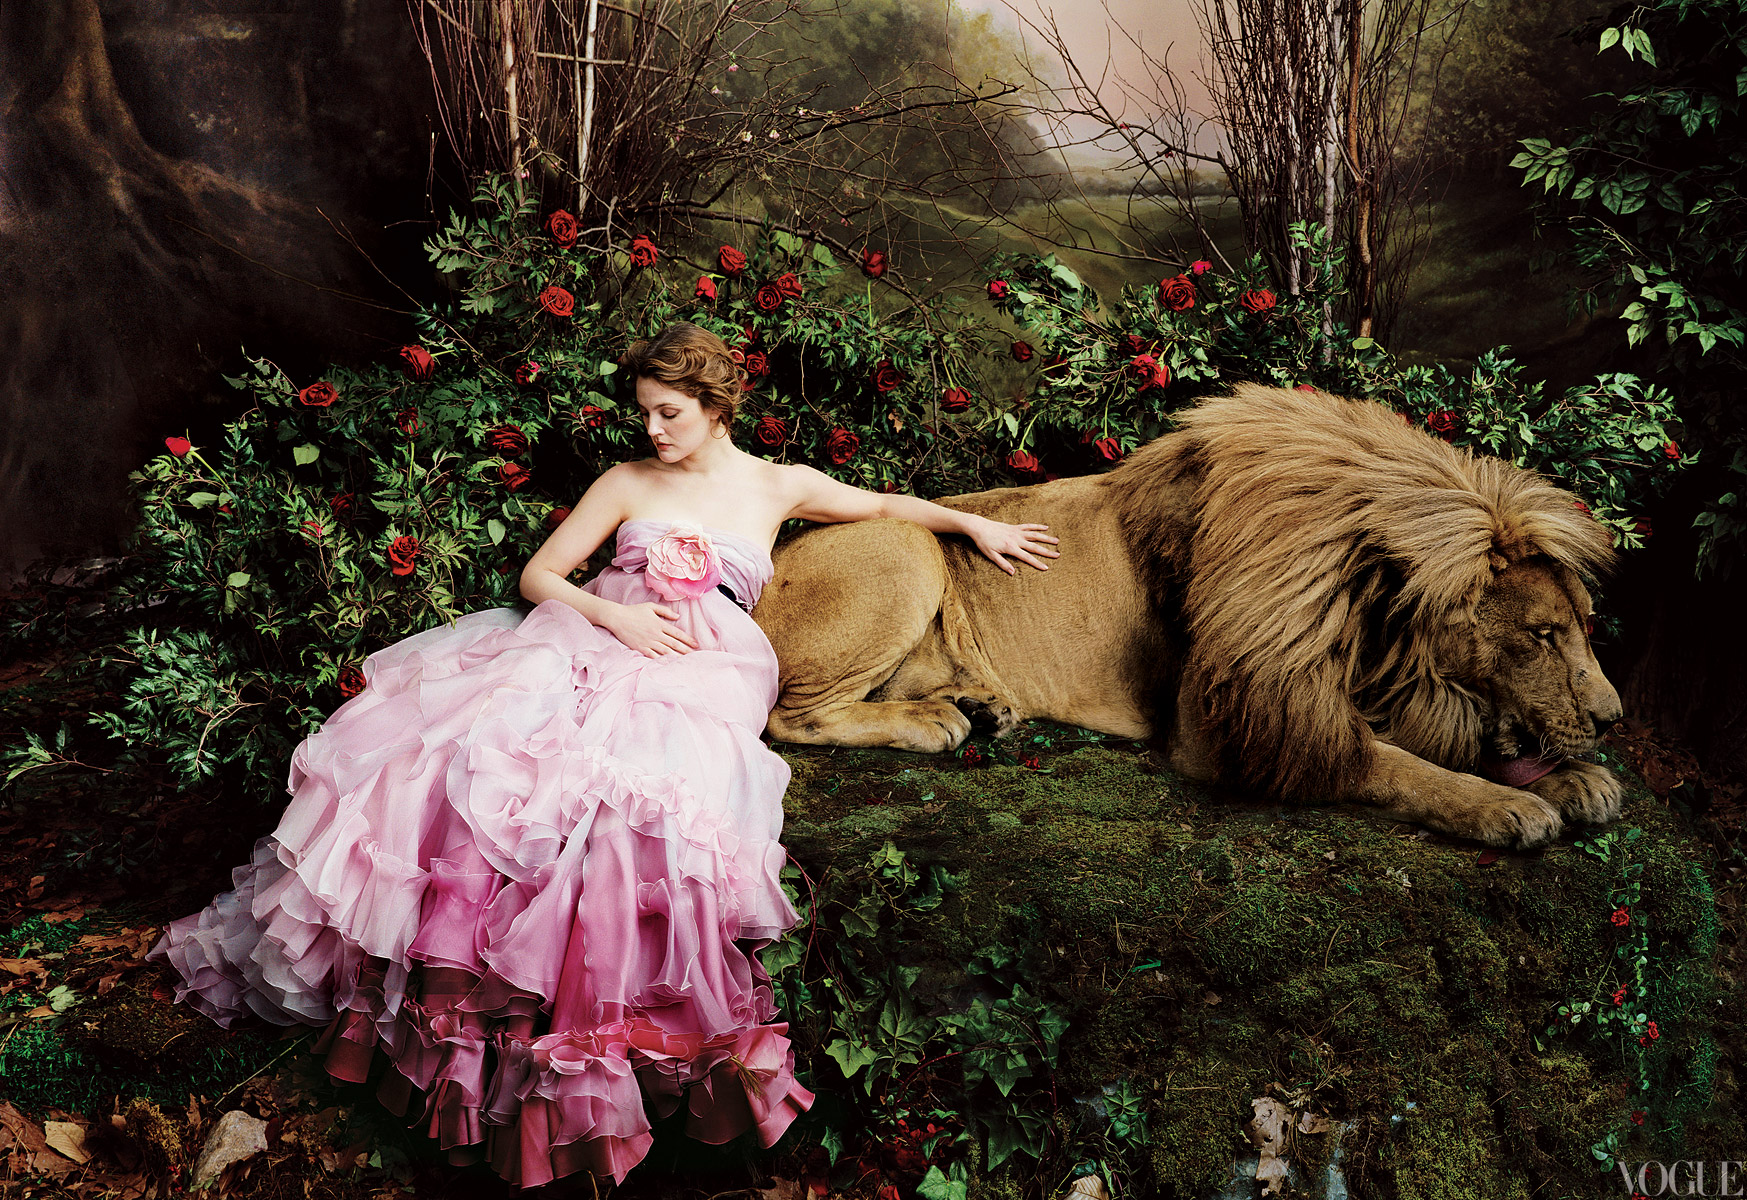 Disney Dream Portraits – Annie Leibovitz